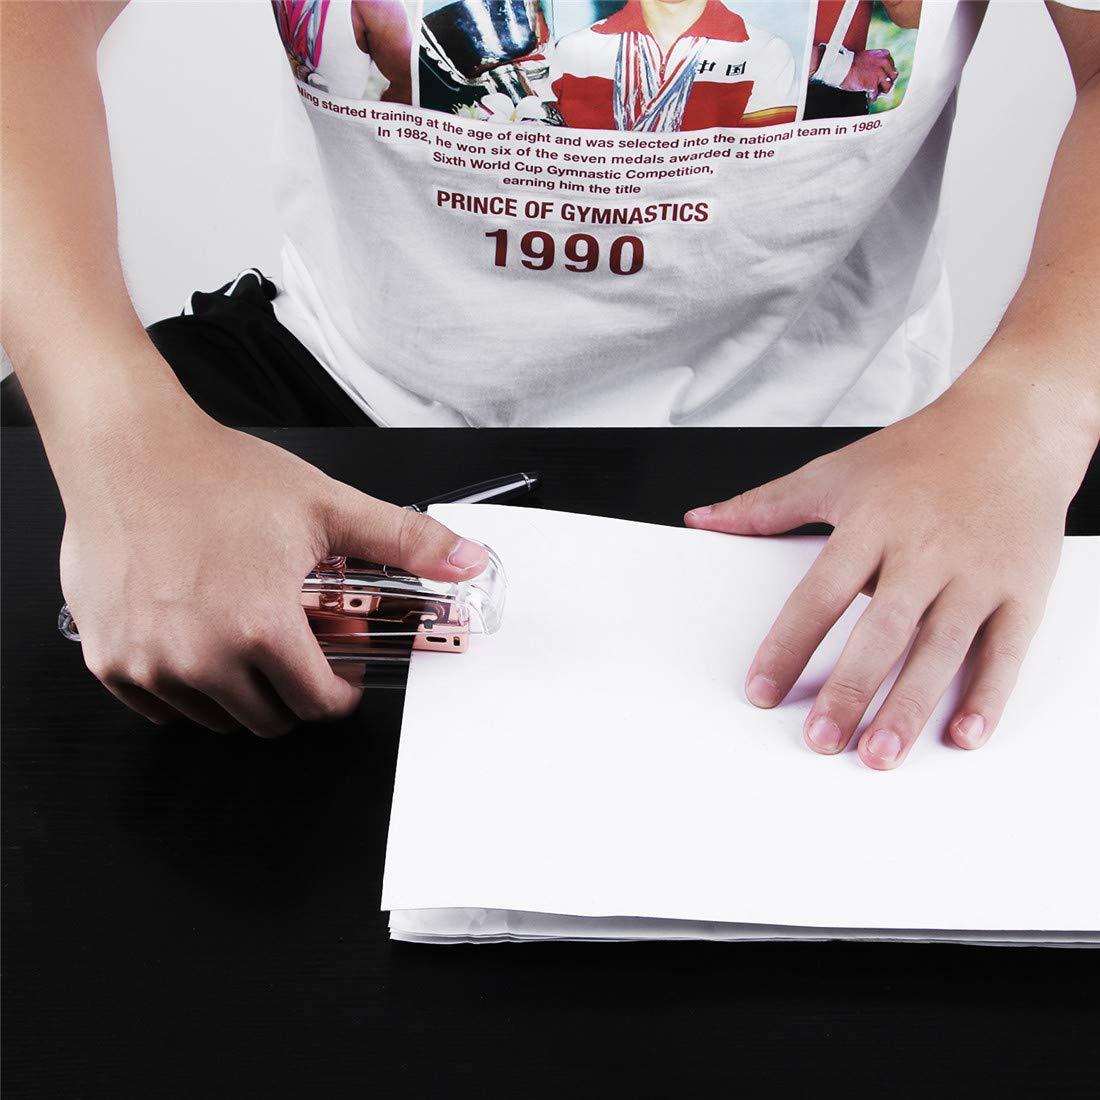 EFISH Agrafeuse de bureau, agrafeuse de bureau à ressort transparent avec agrafes 1000 pièces - Or rose